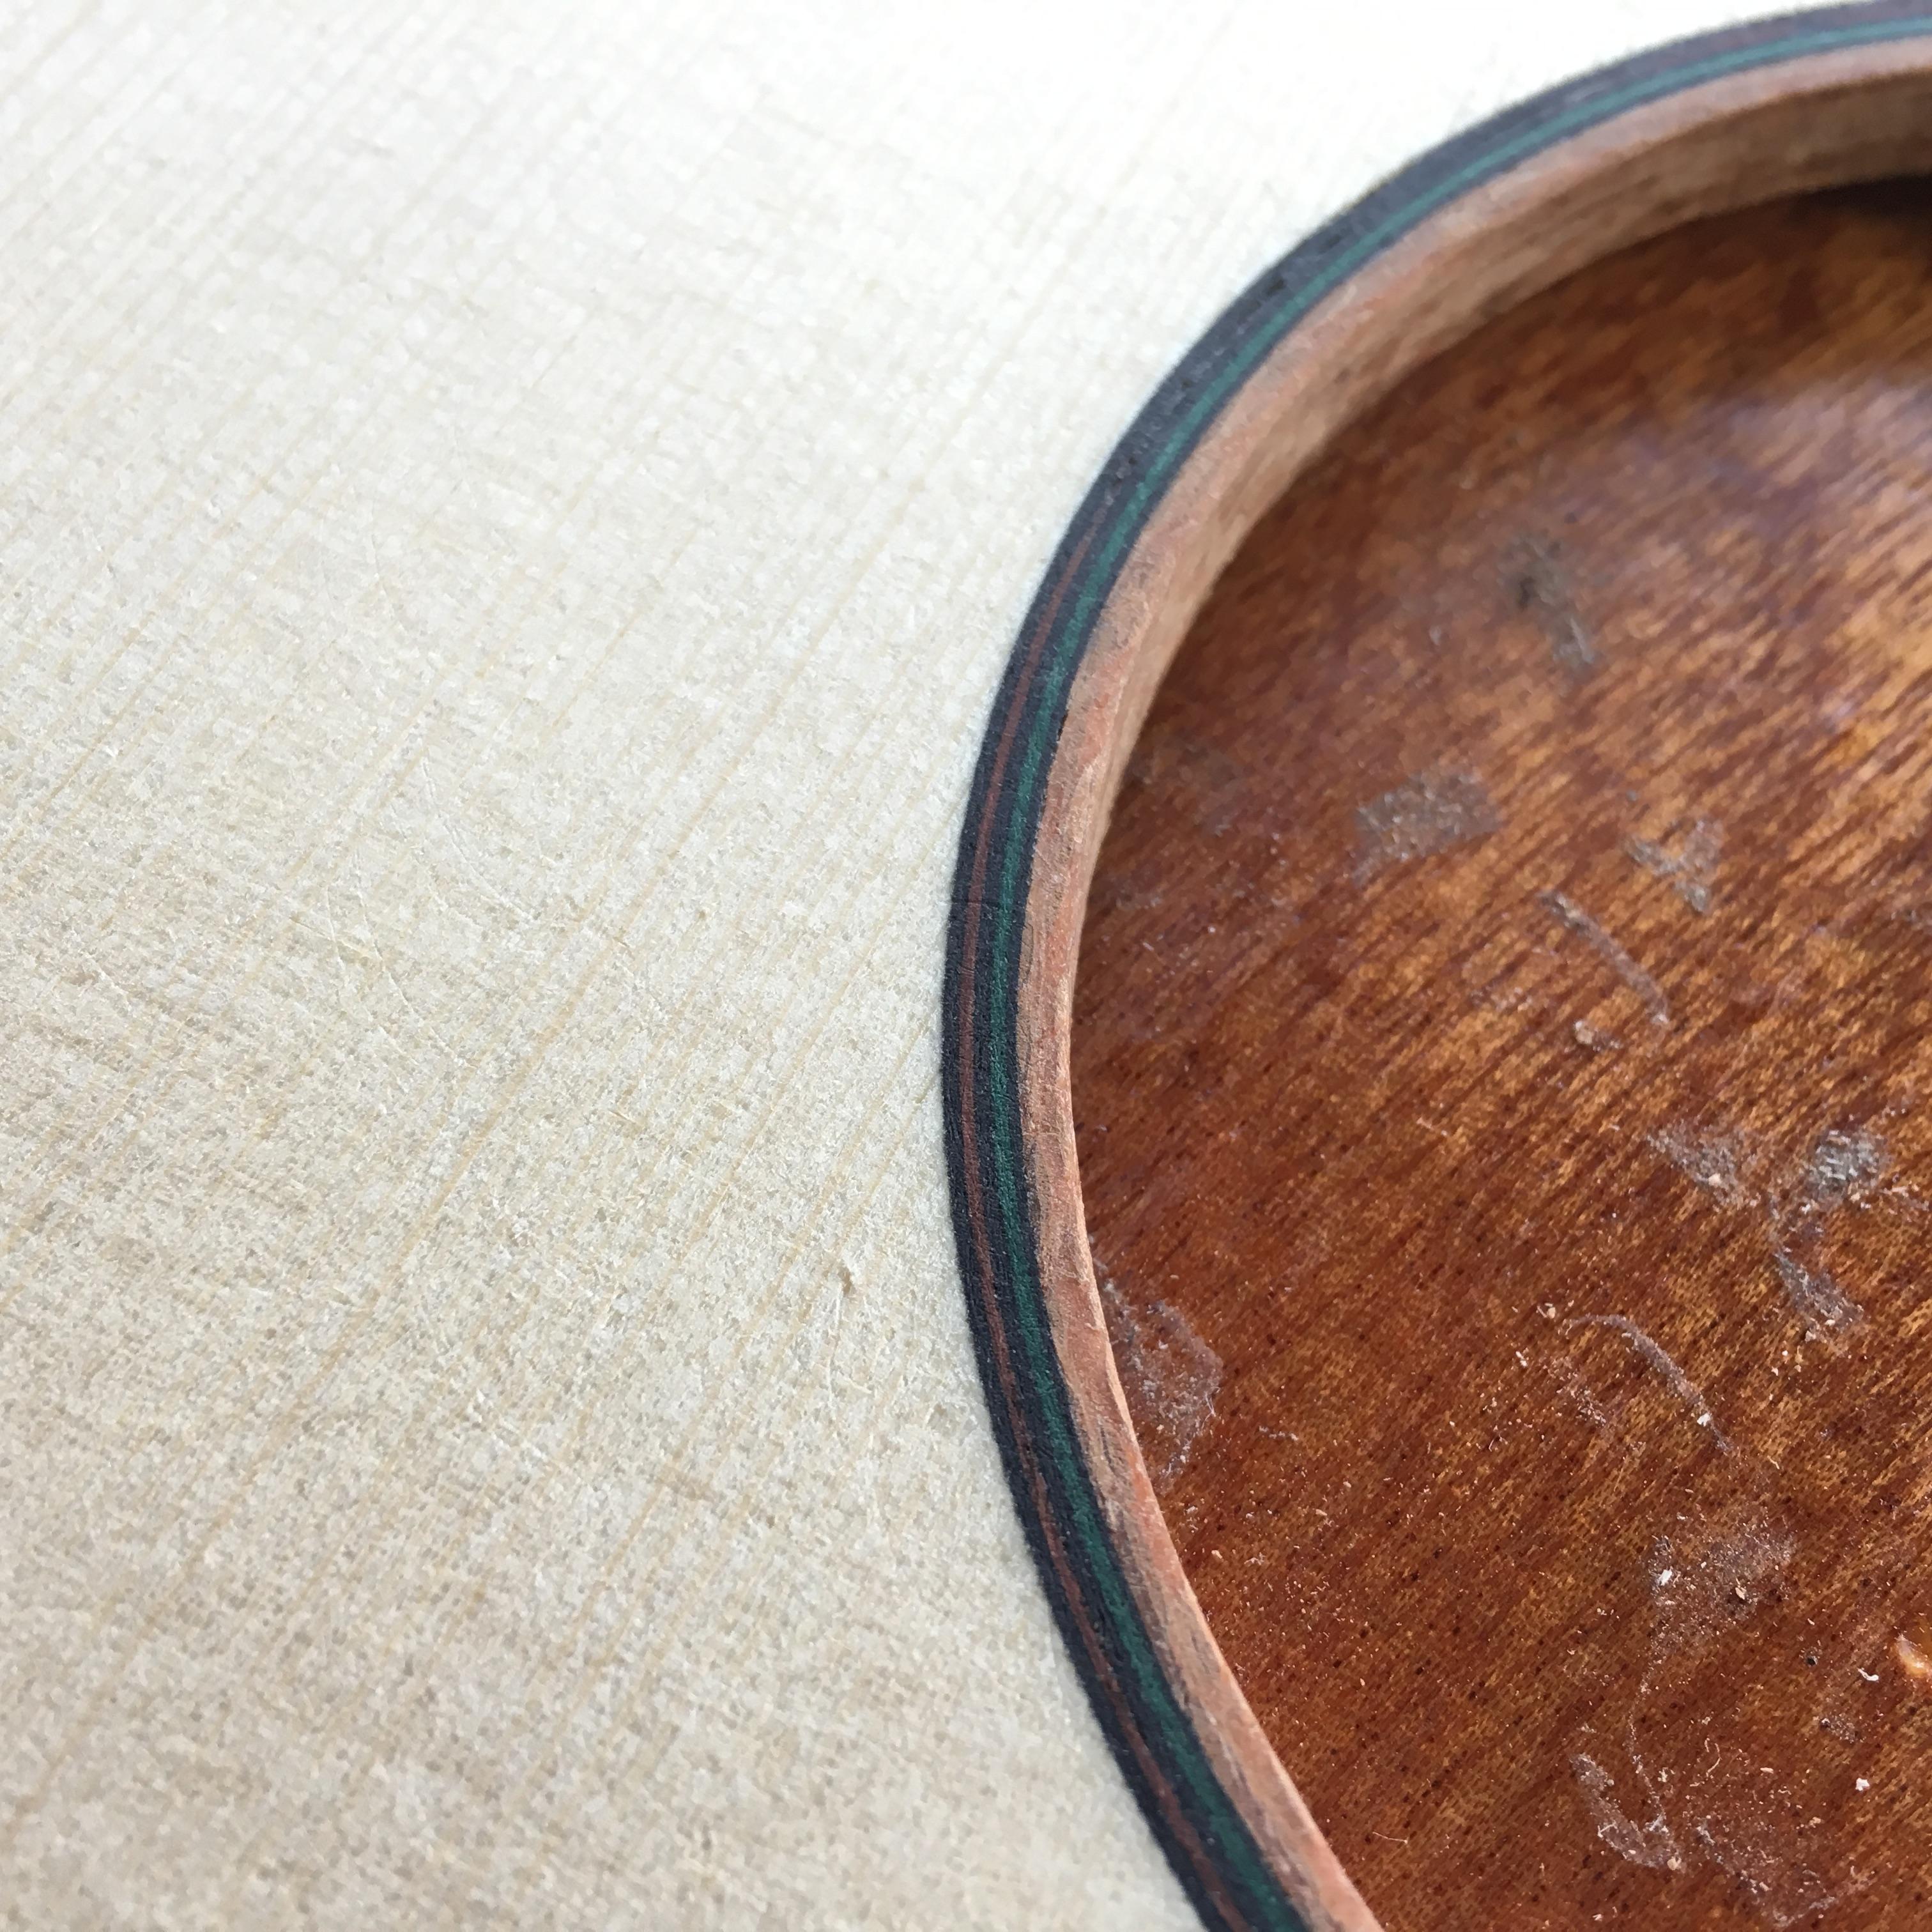 rosette inlay, binding, sounhole, montgomery guitar